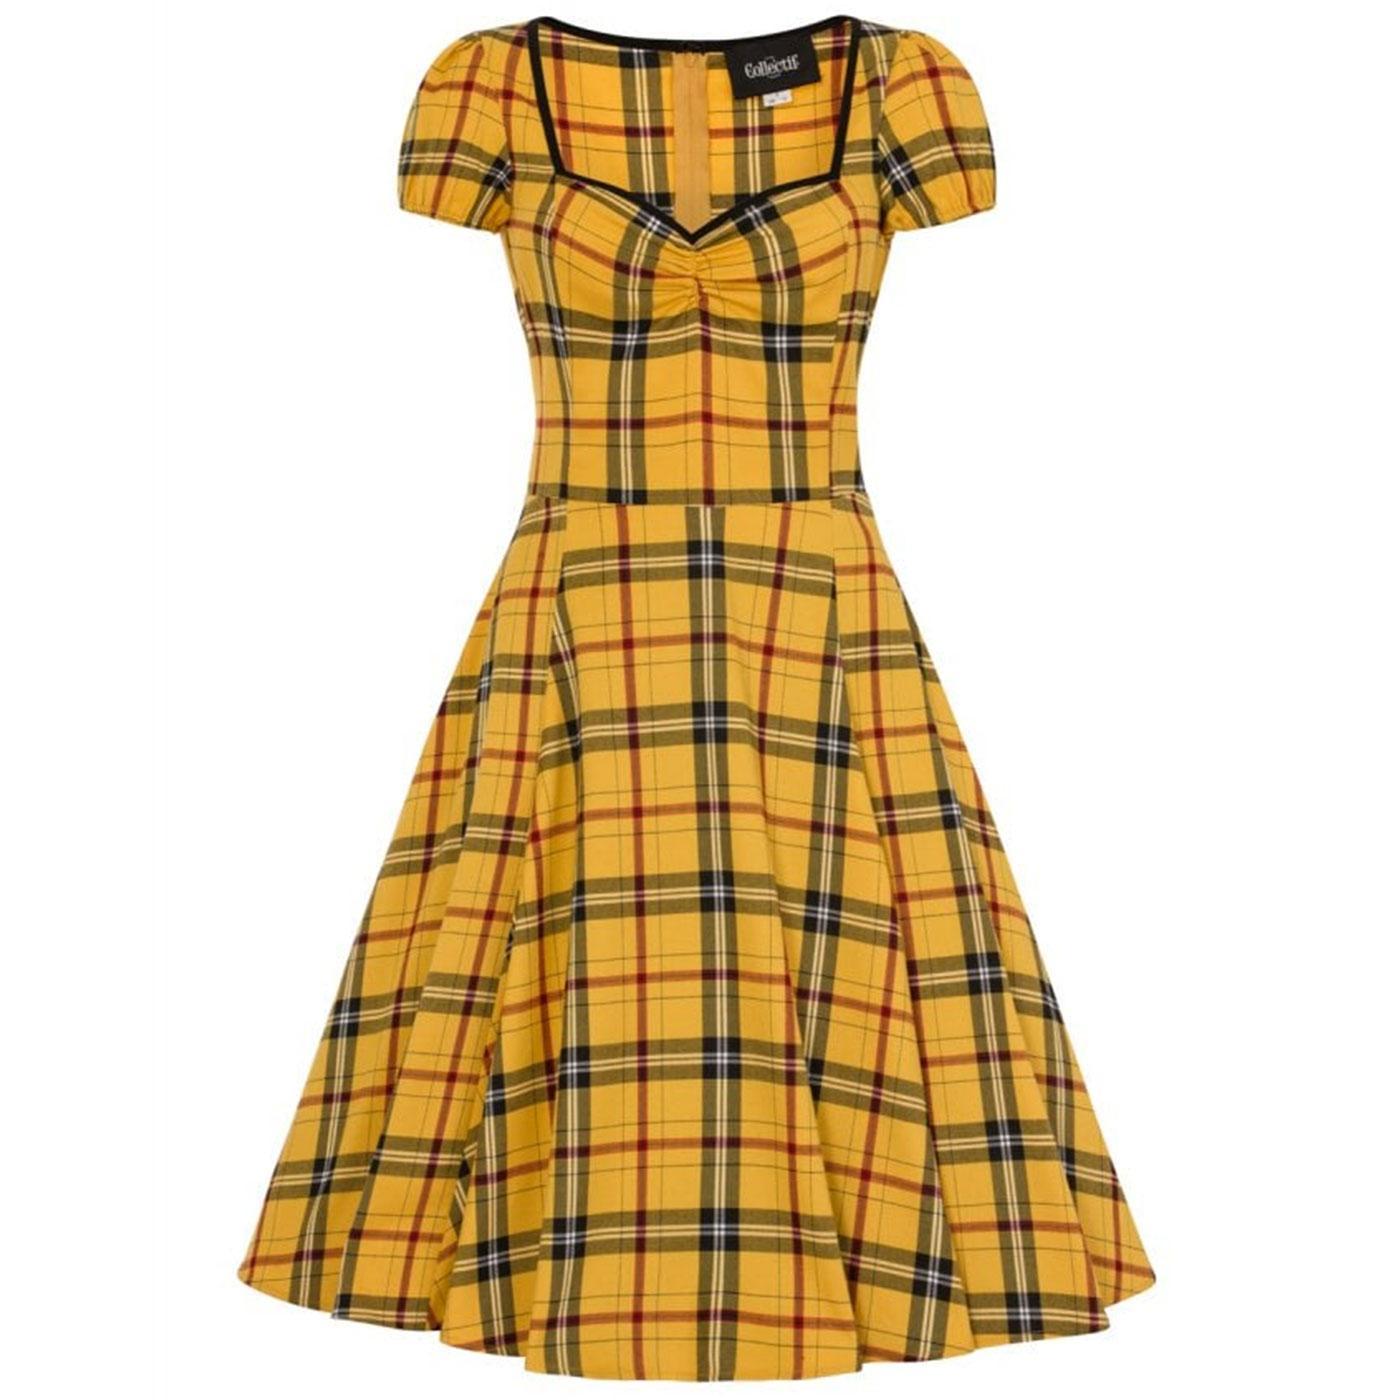 Mimi COLLECTIF Retro 50s Clueless Check Doll Dress